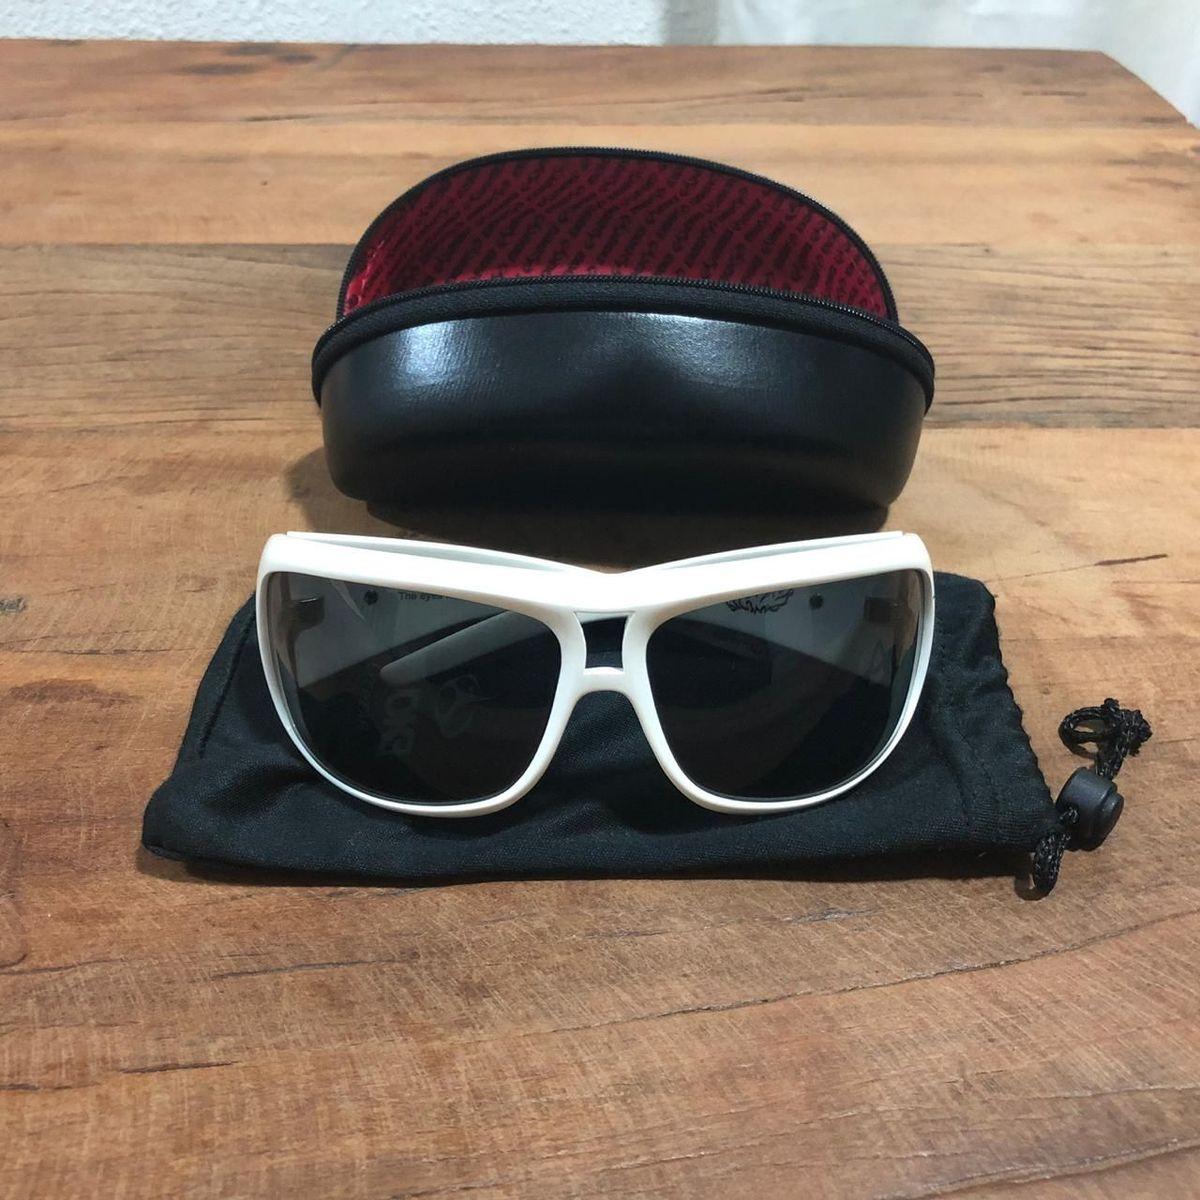 849ee9be5 Óculos de Sol Evoke Haze | Óculos Masculino Evoke Usado 32576950 | enjoei